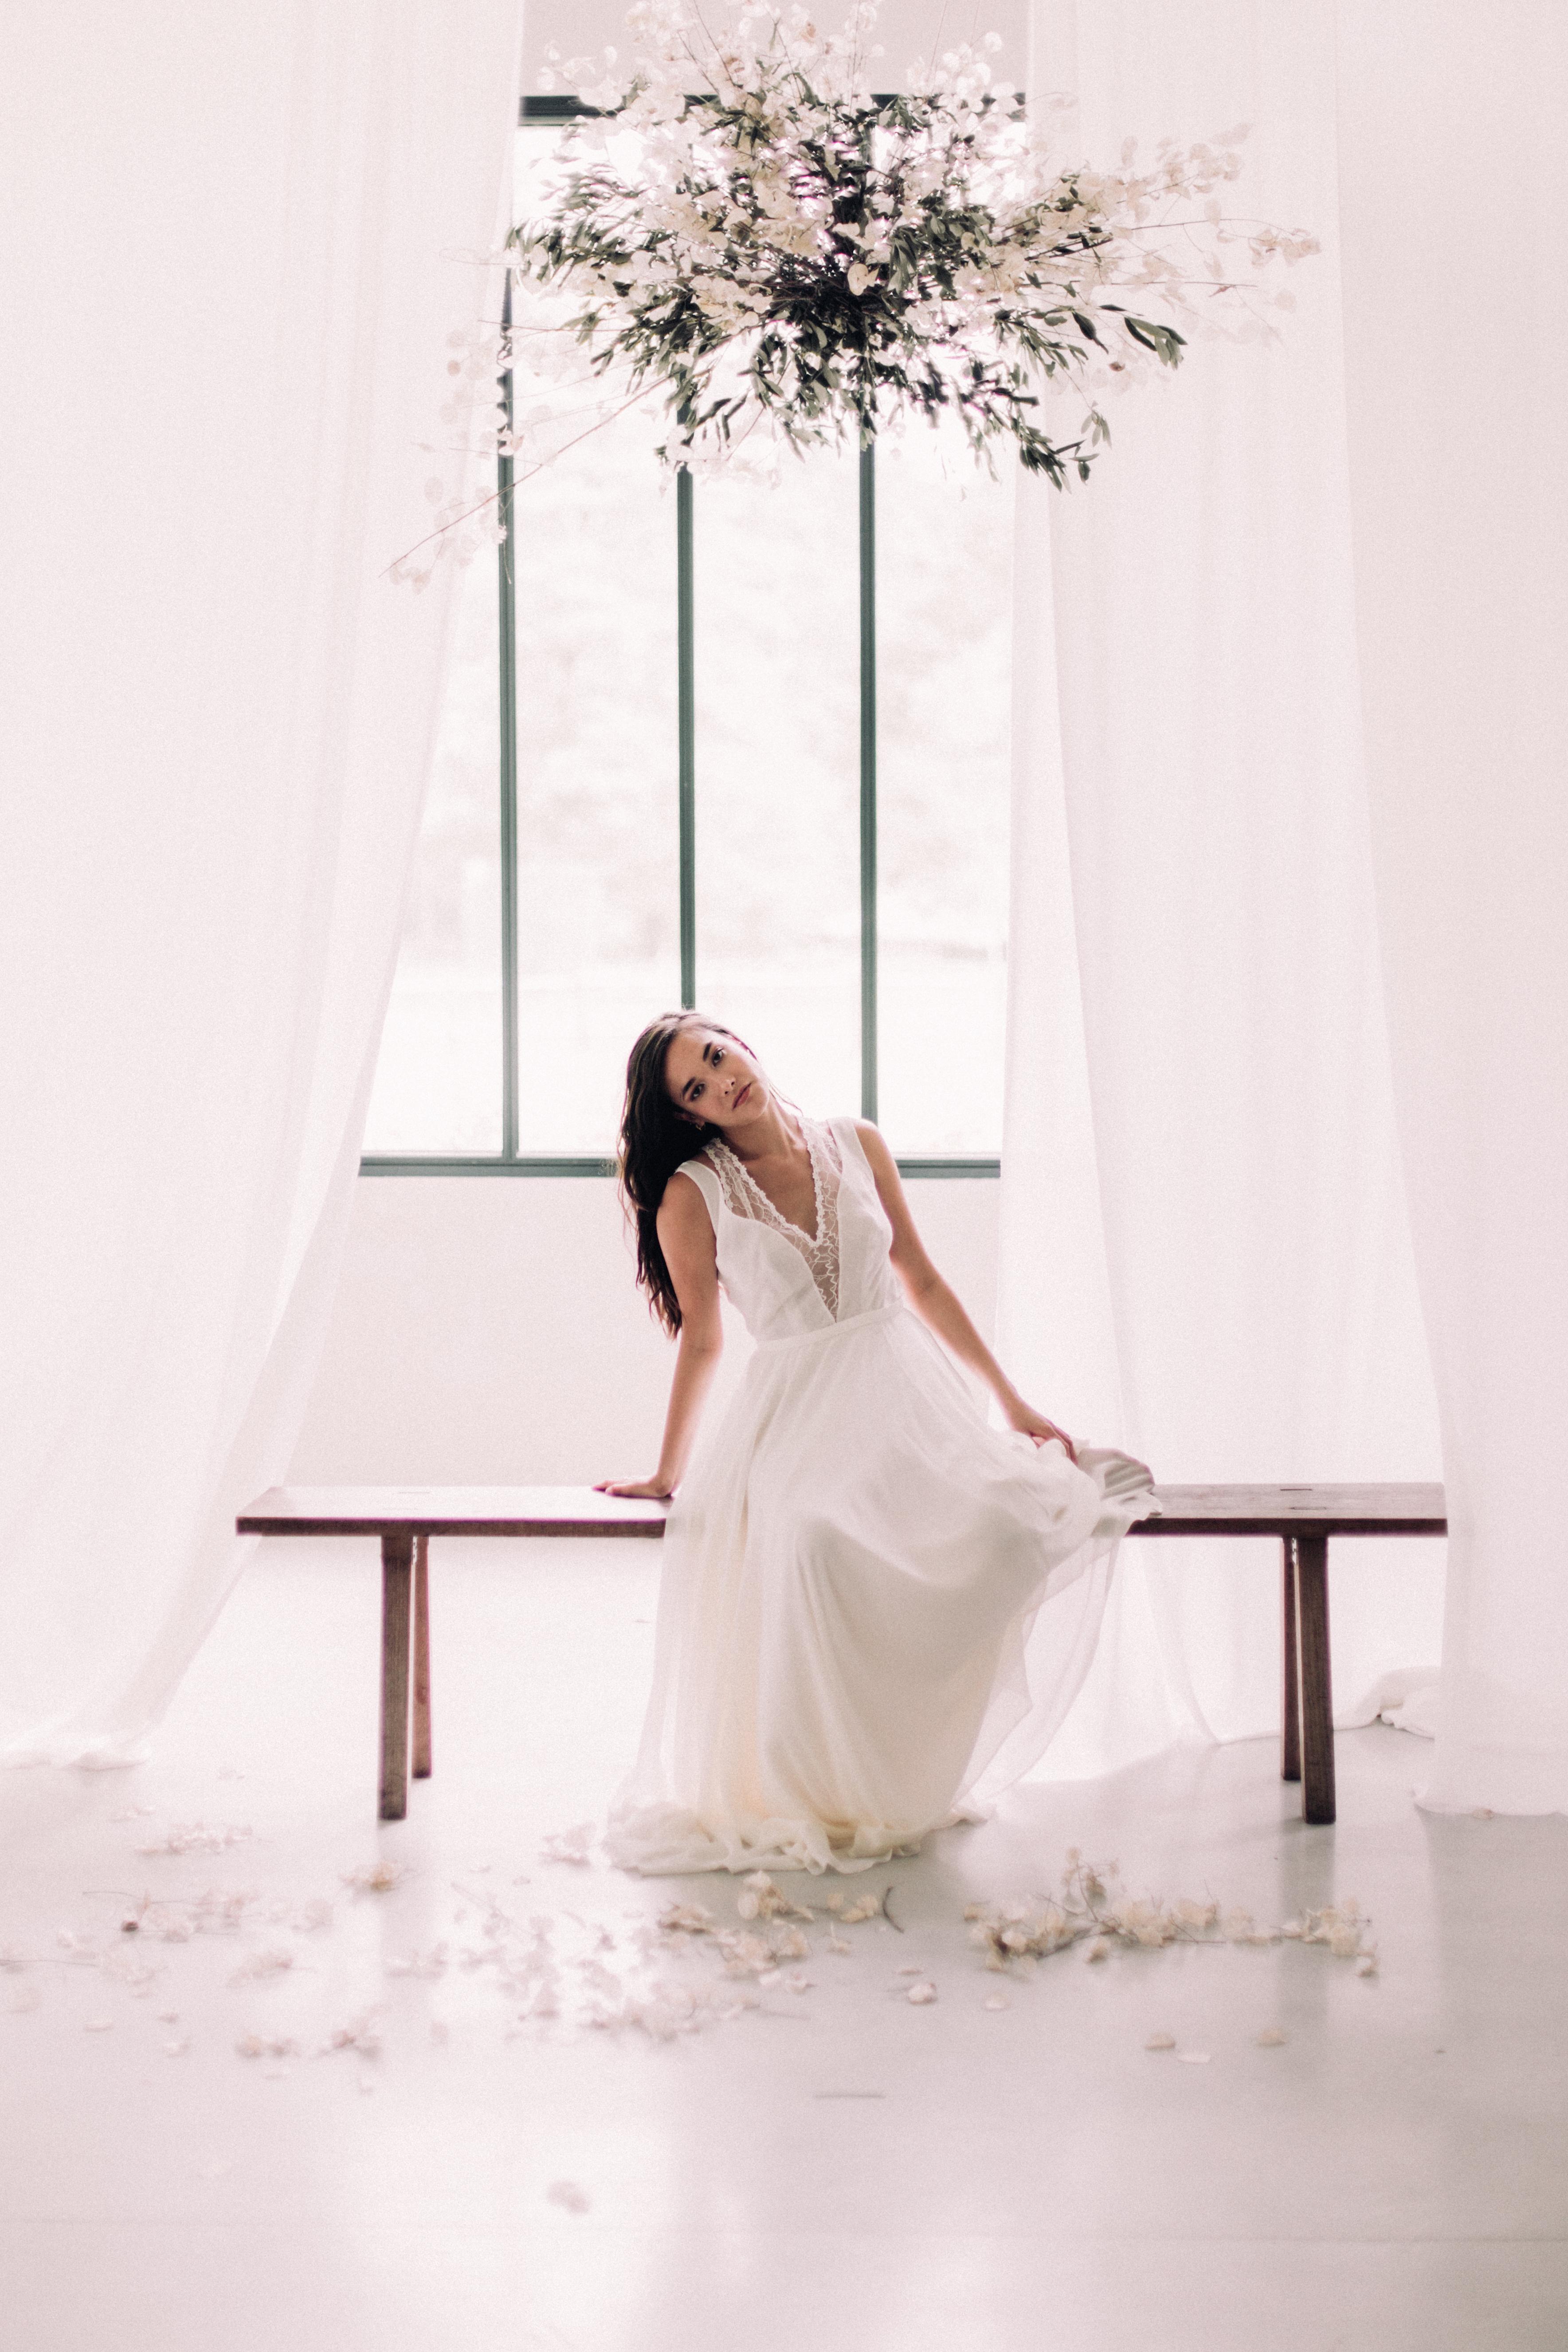 Atelier Swan – Collection 2019 : Le Ballet